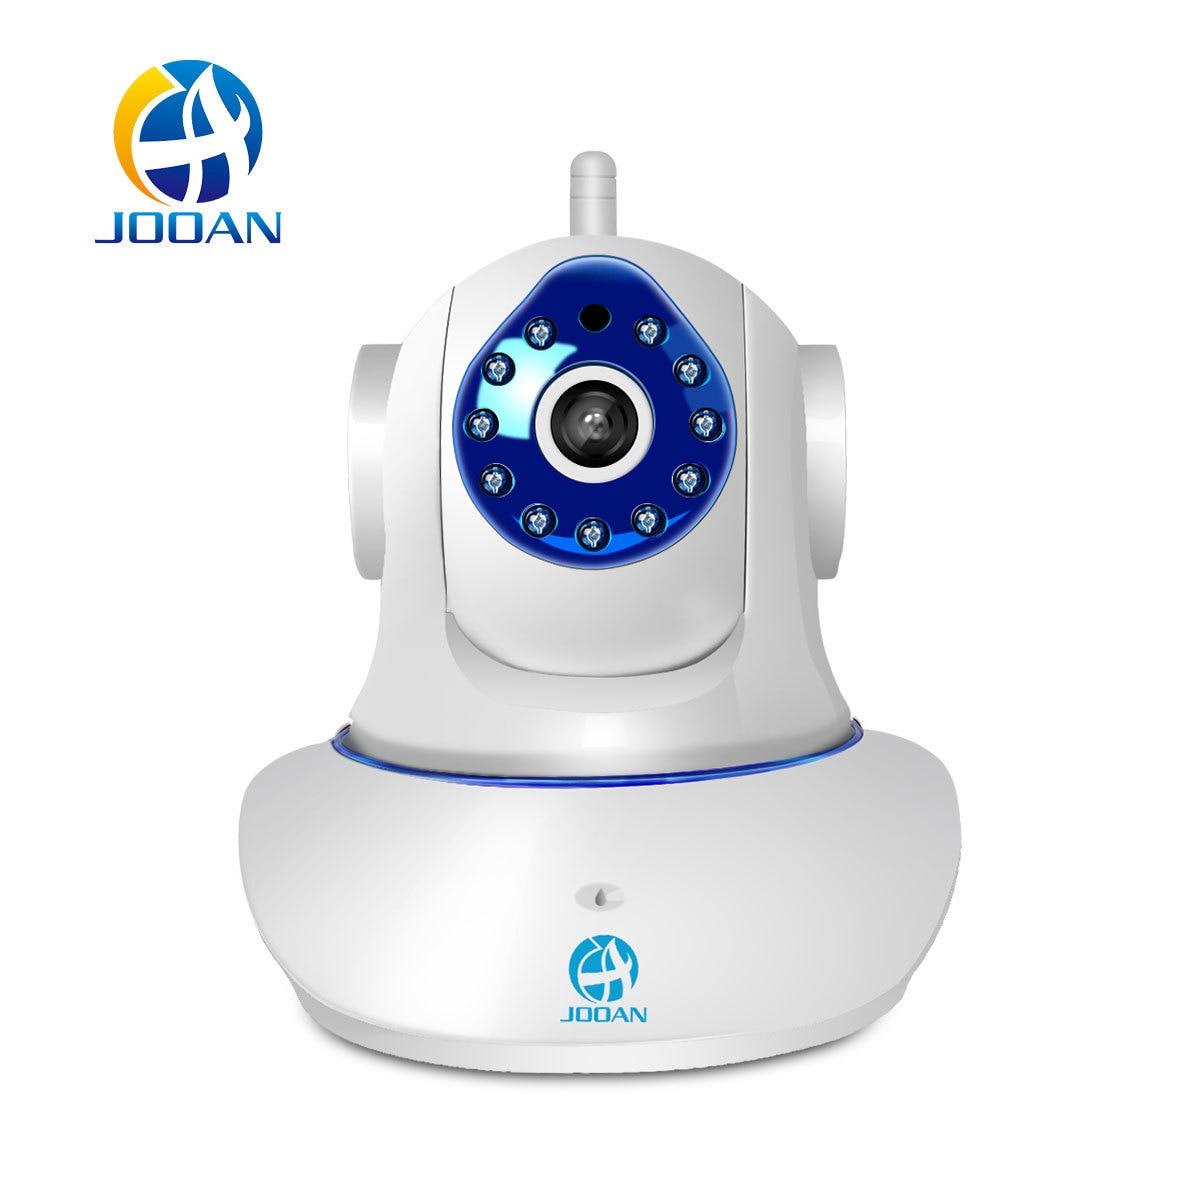 JOOAN 770CR W 1080p Network Wireless Ip Camera Security Video Surveillance 2 0mp WIFI Baby Monitor